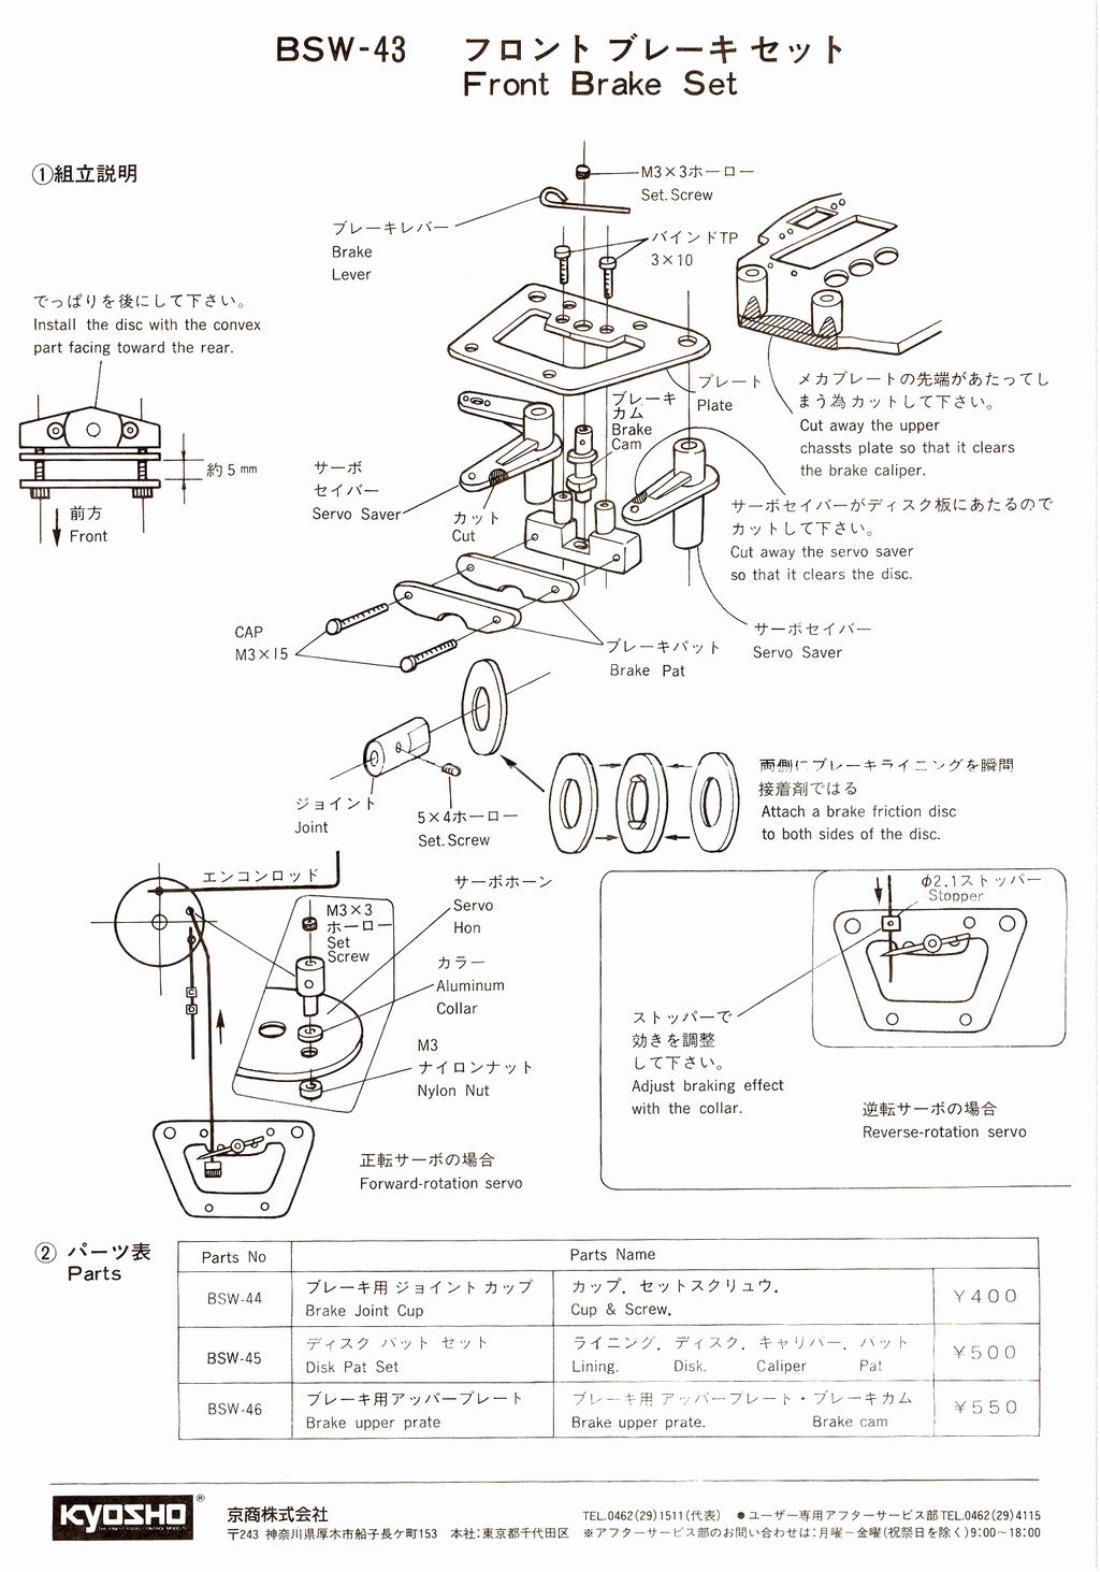 99998: Kyosho from INTEGRA FAN showroom, TURBO BURNS kit